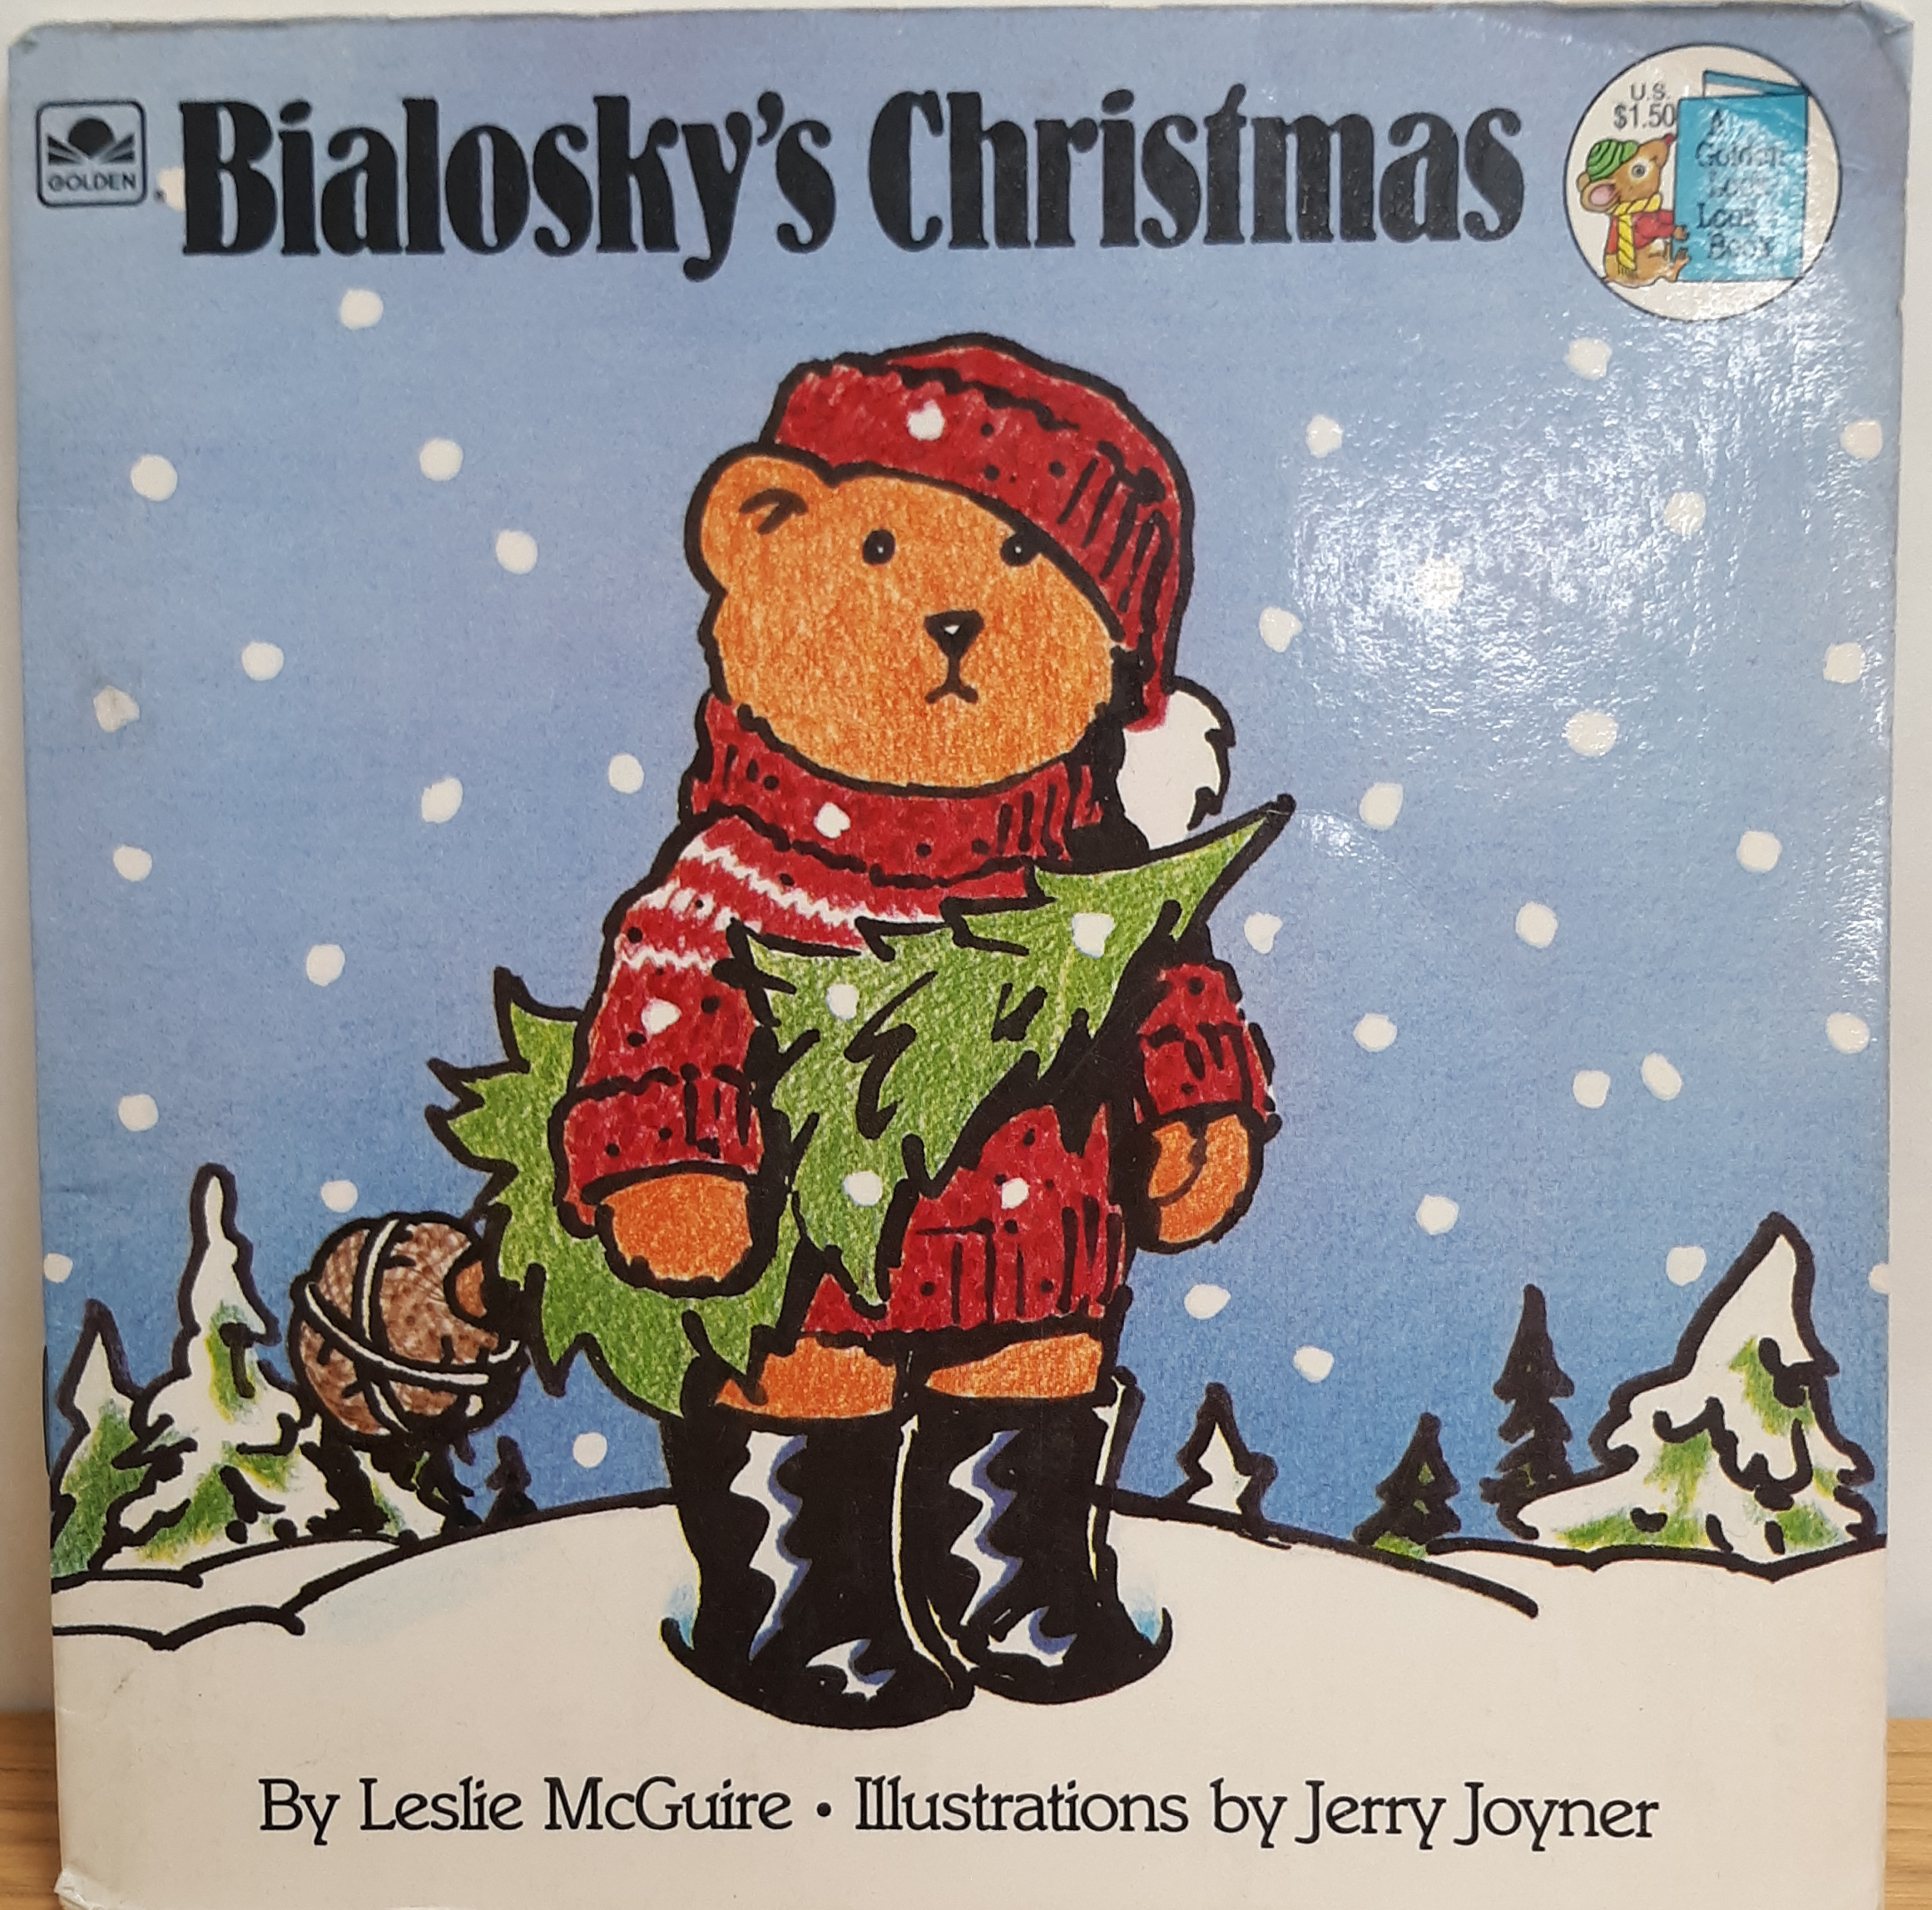 https://0201.nccdn.net/1_2/000/000/12c/223/bialoskys-christmas-.png